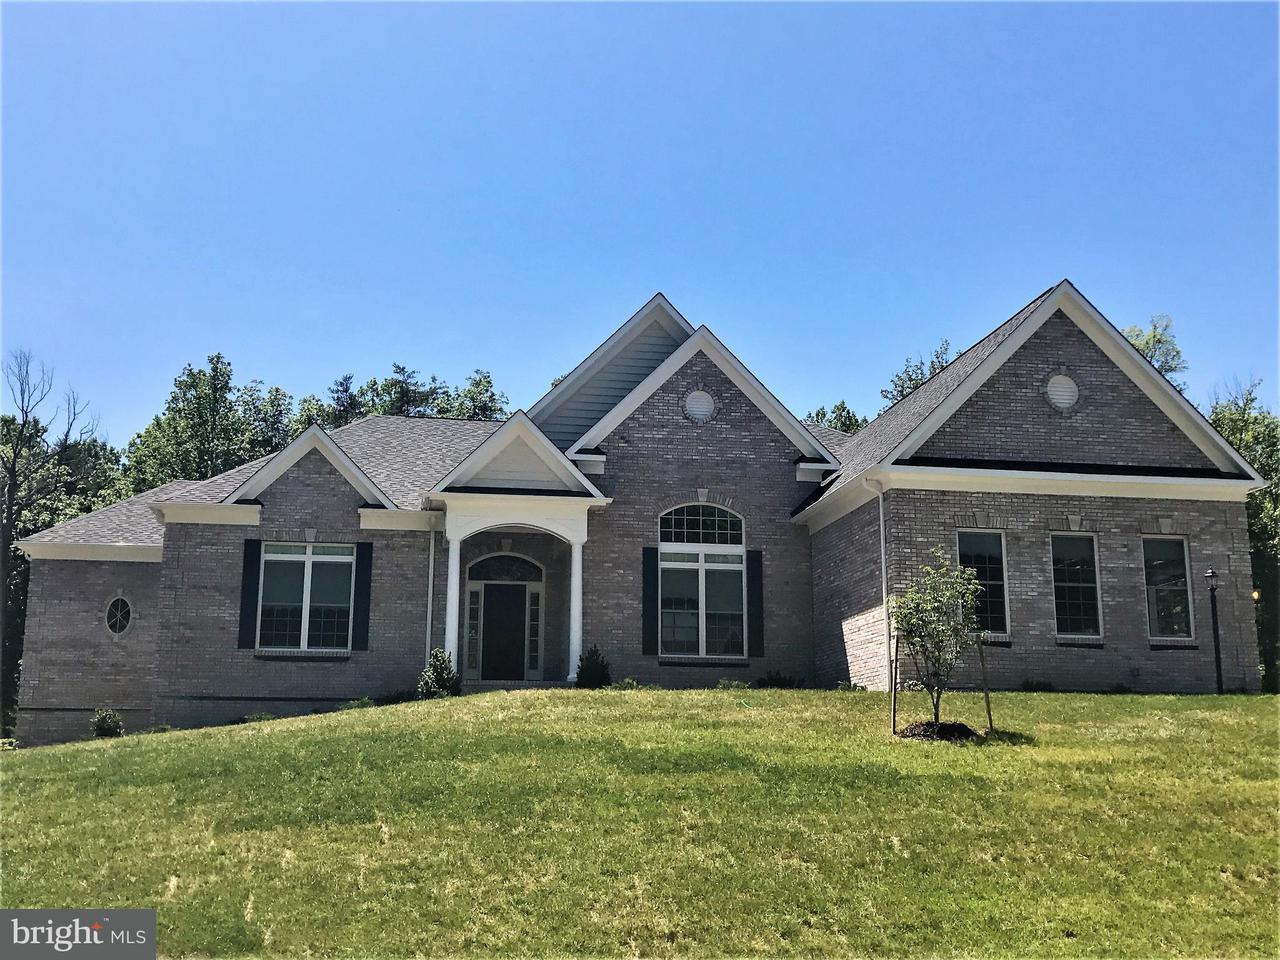 Single Family Home for Sale at 13651 Hidden Creek Road 13651 Hidden Creek Road Manassas, Virginia 20112 United States